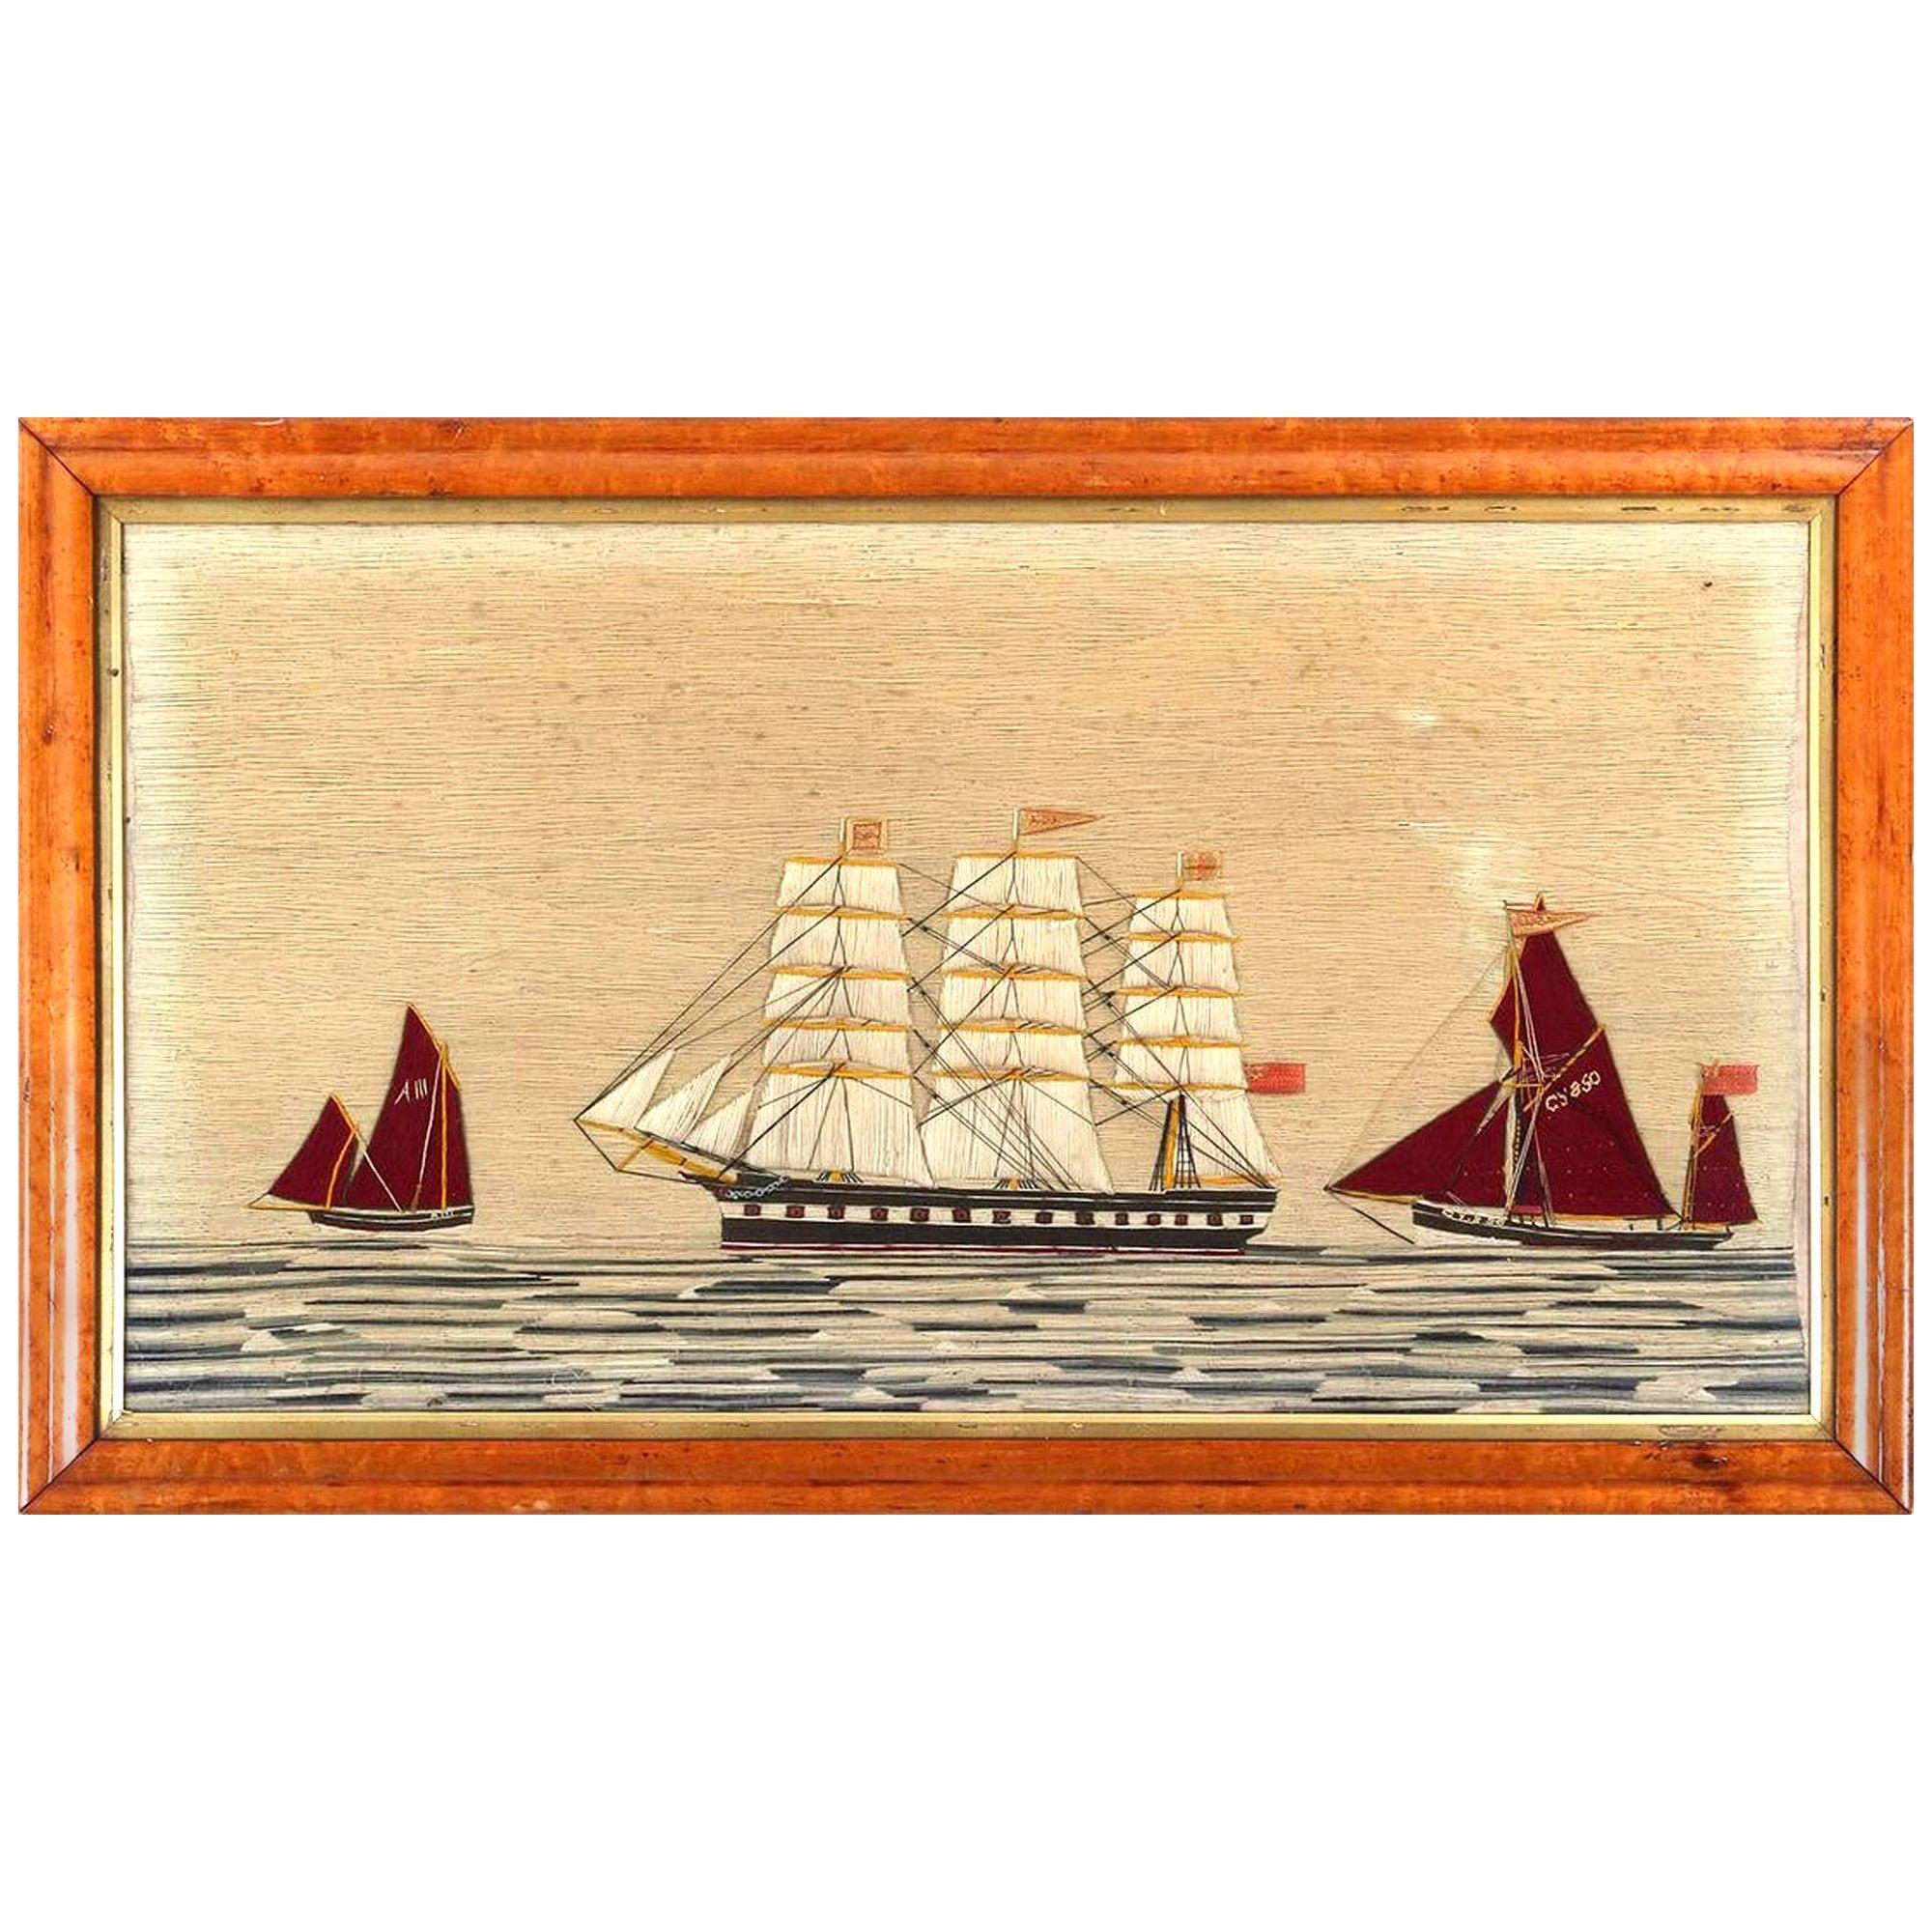 British Woolwork 'Woolie' of Three Ships, circa 1875